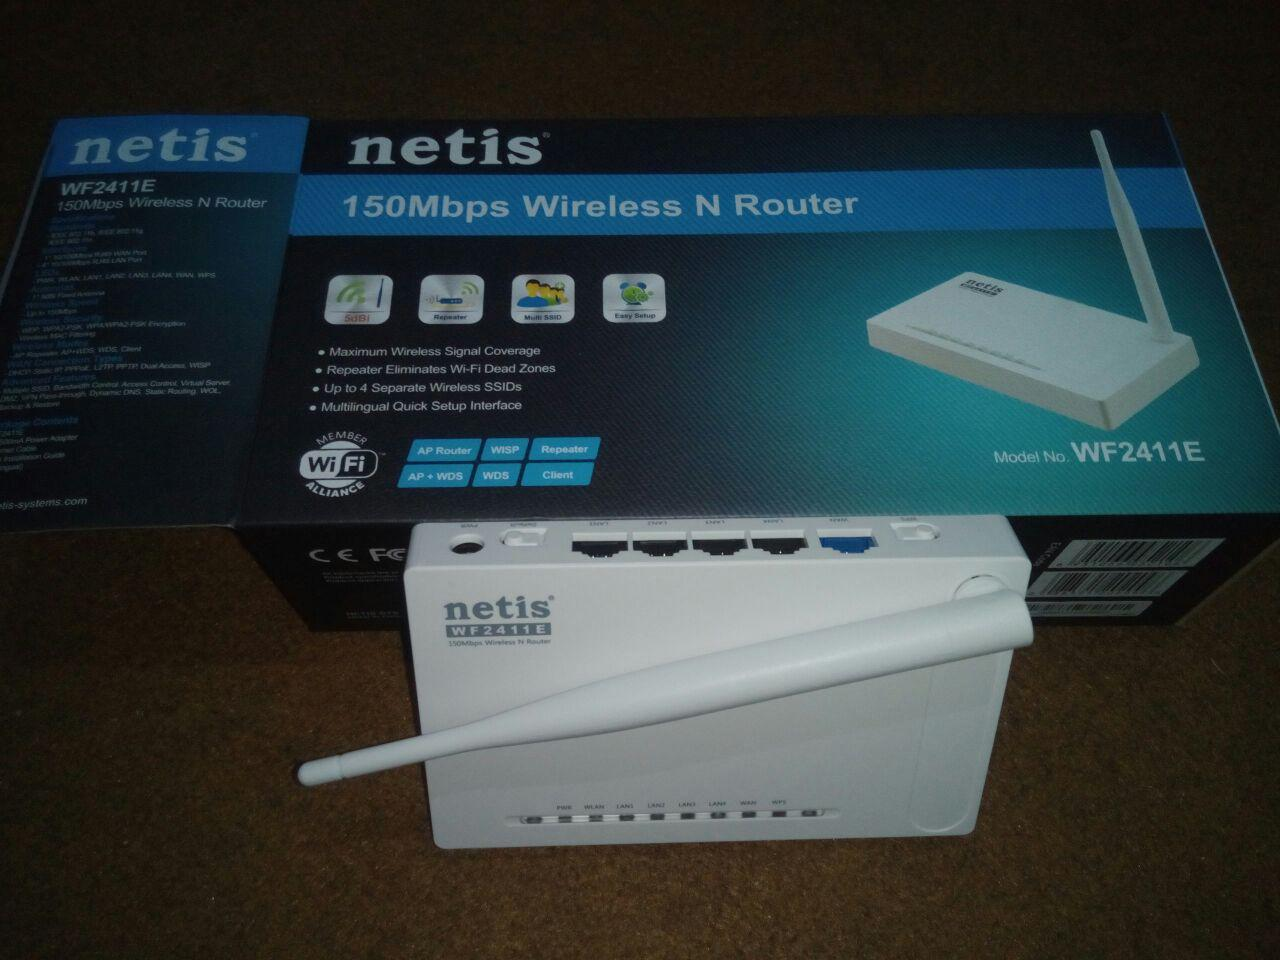 Jual Netis Wireless Router Incomnet Tokopedia Wf2411e 150mbps